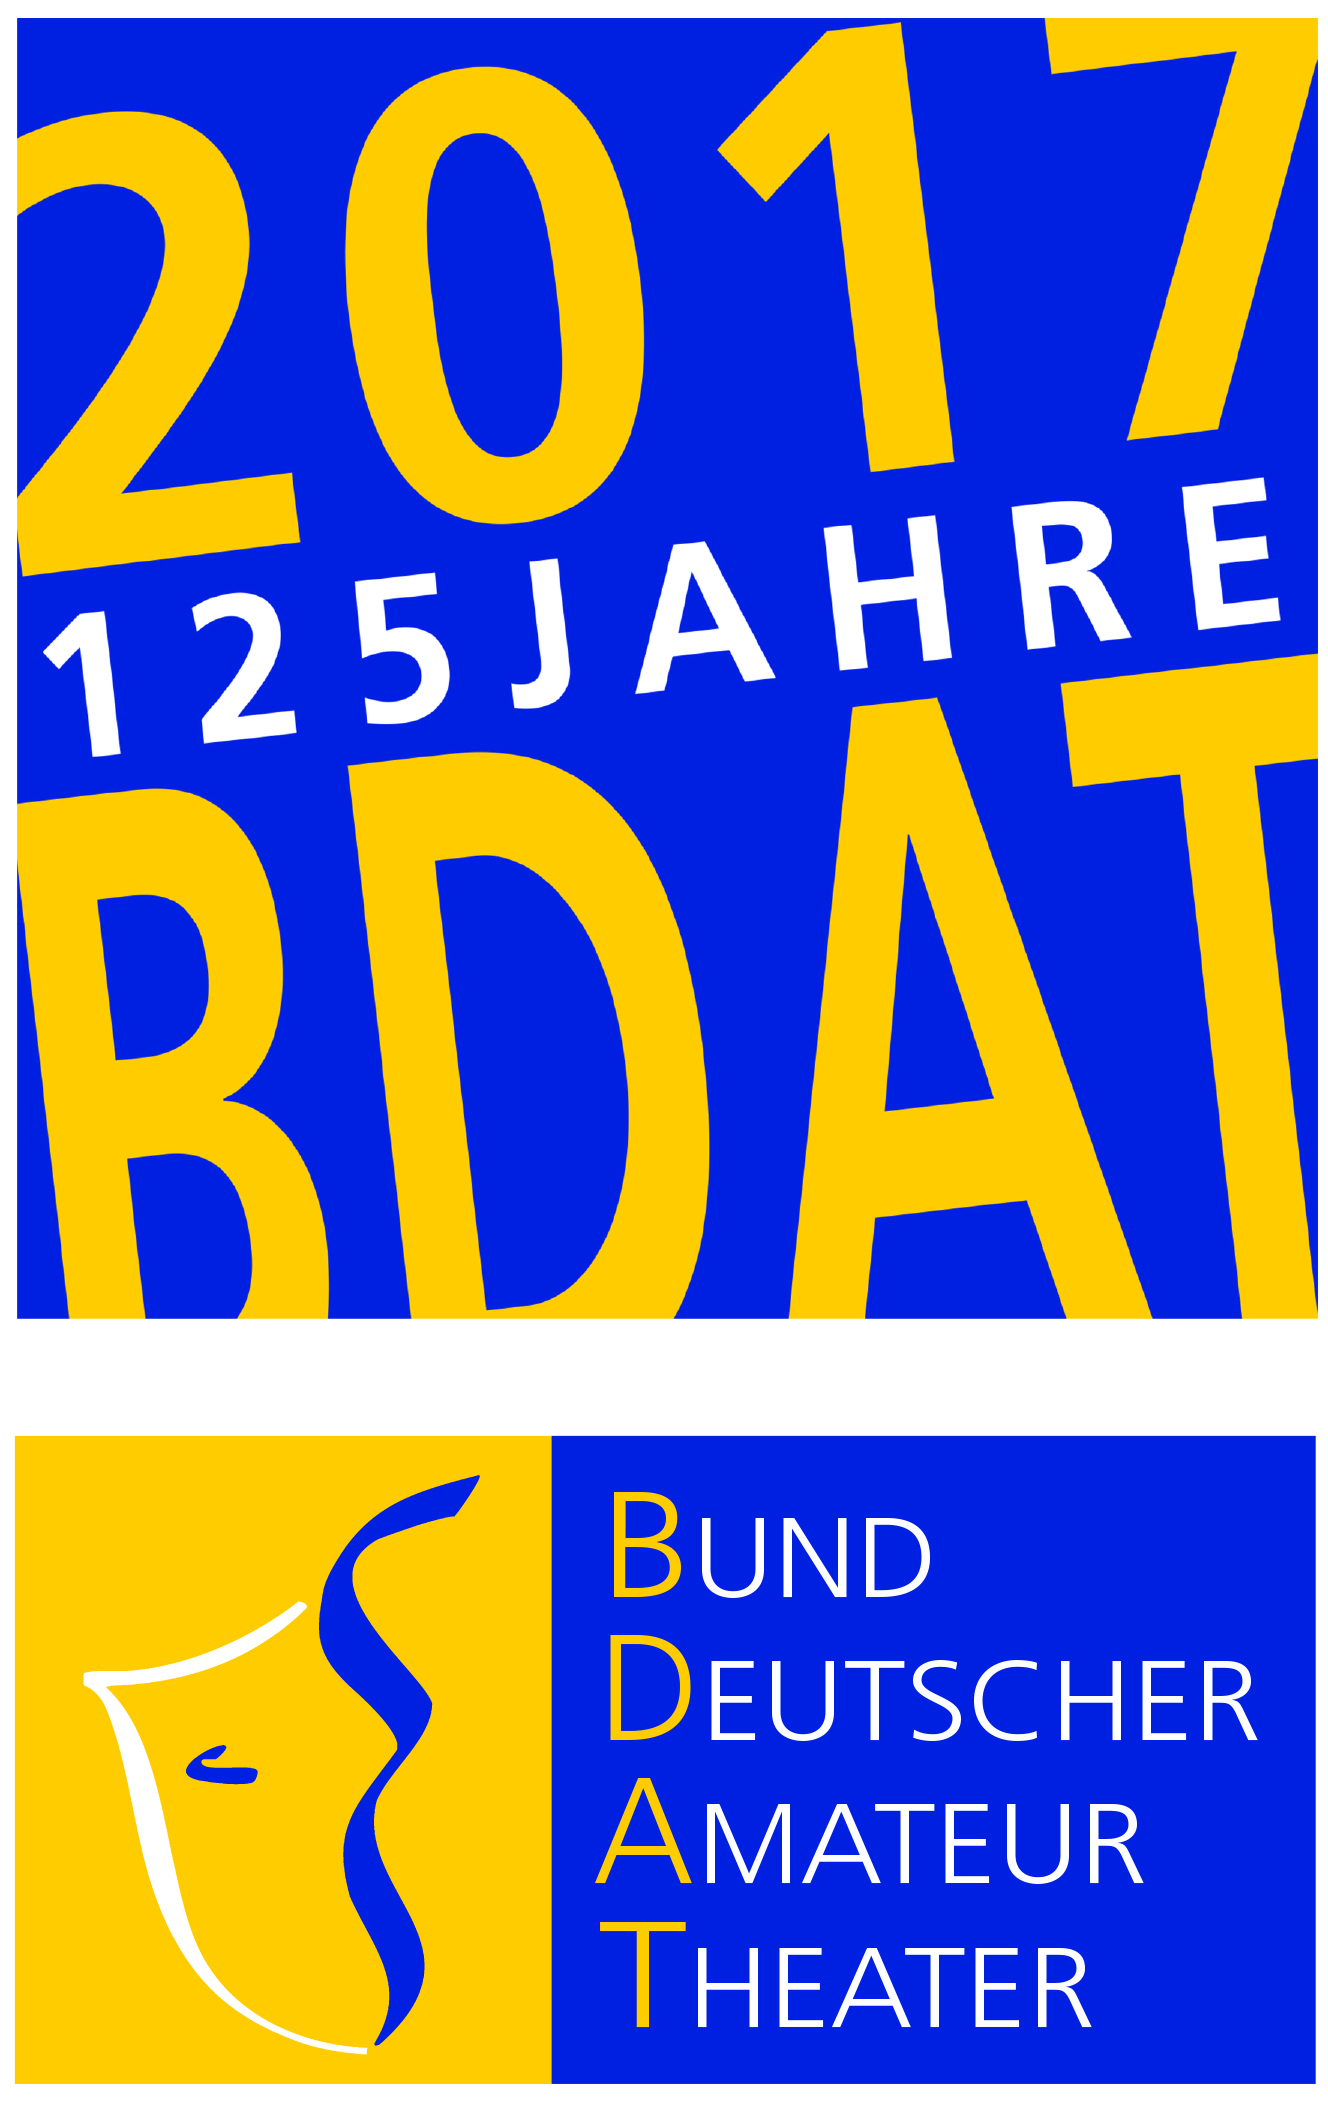 http://125-jahre.bdat.info/wp-content/uploads/sites/7/2016/03/logo-125-bdat-fr.jpg